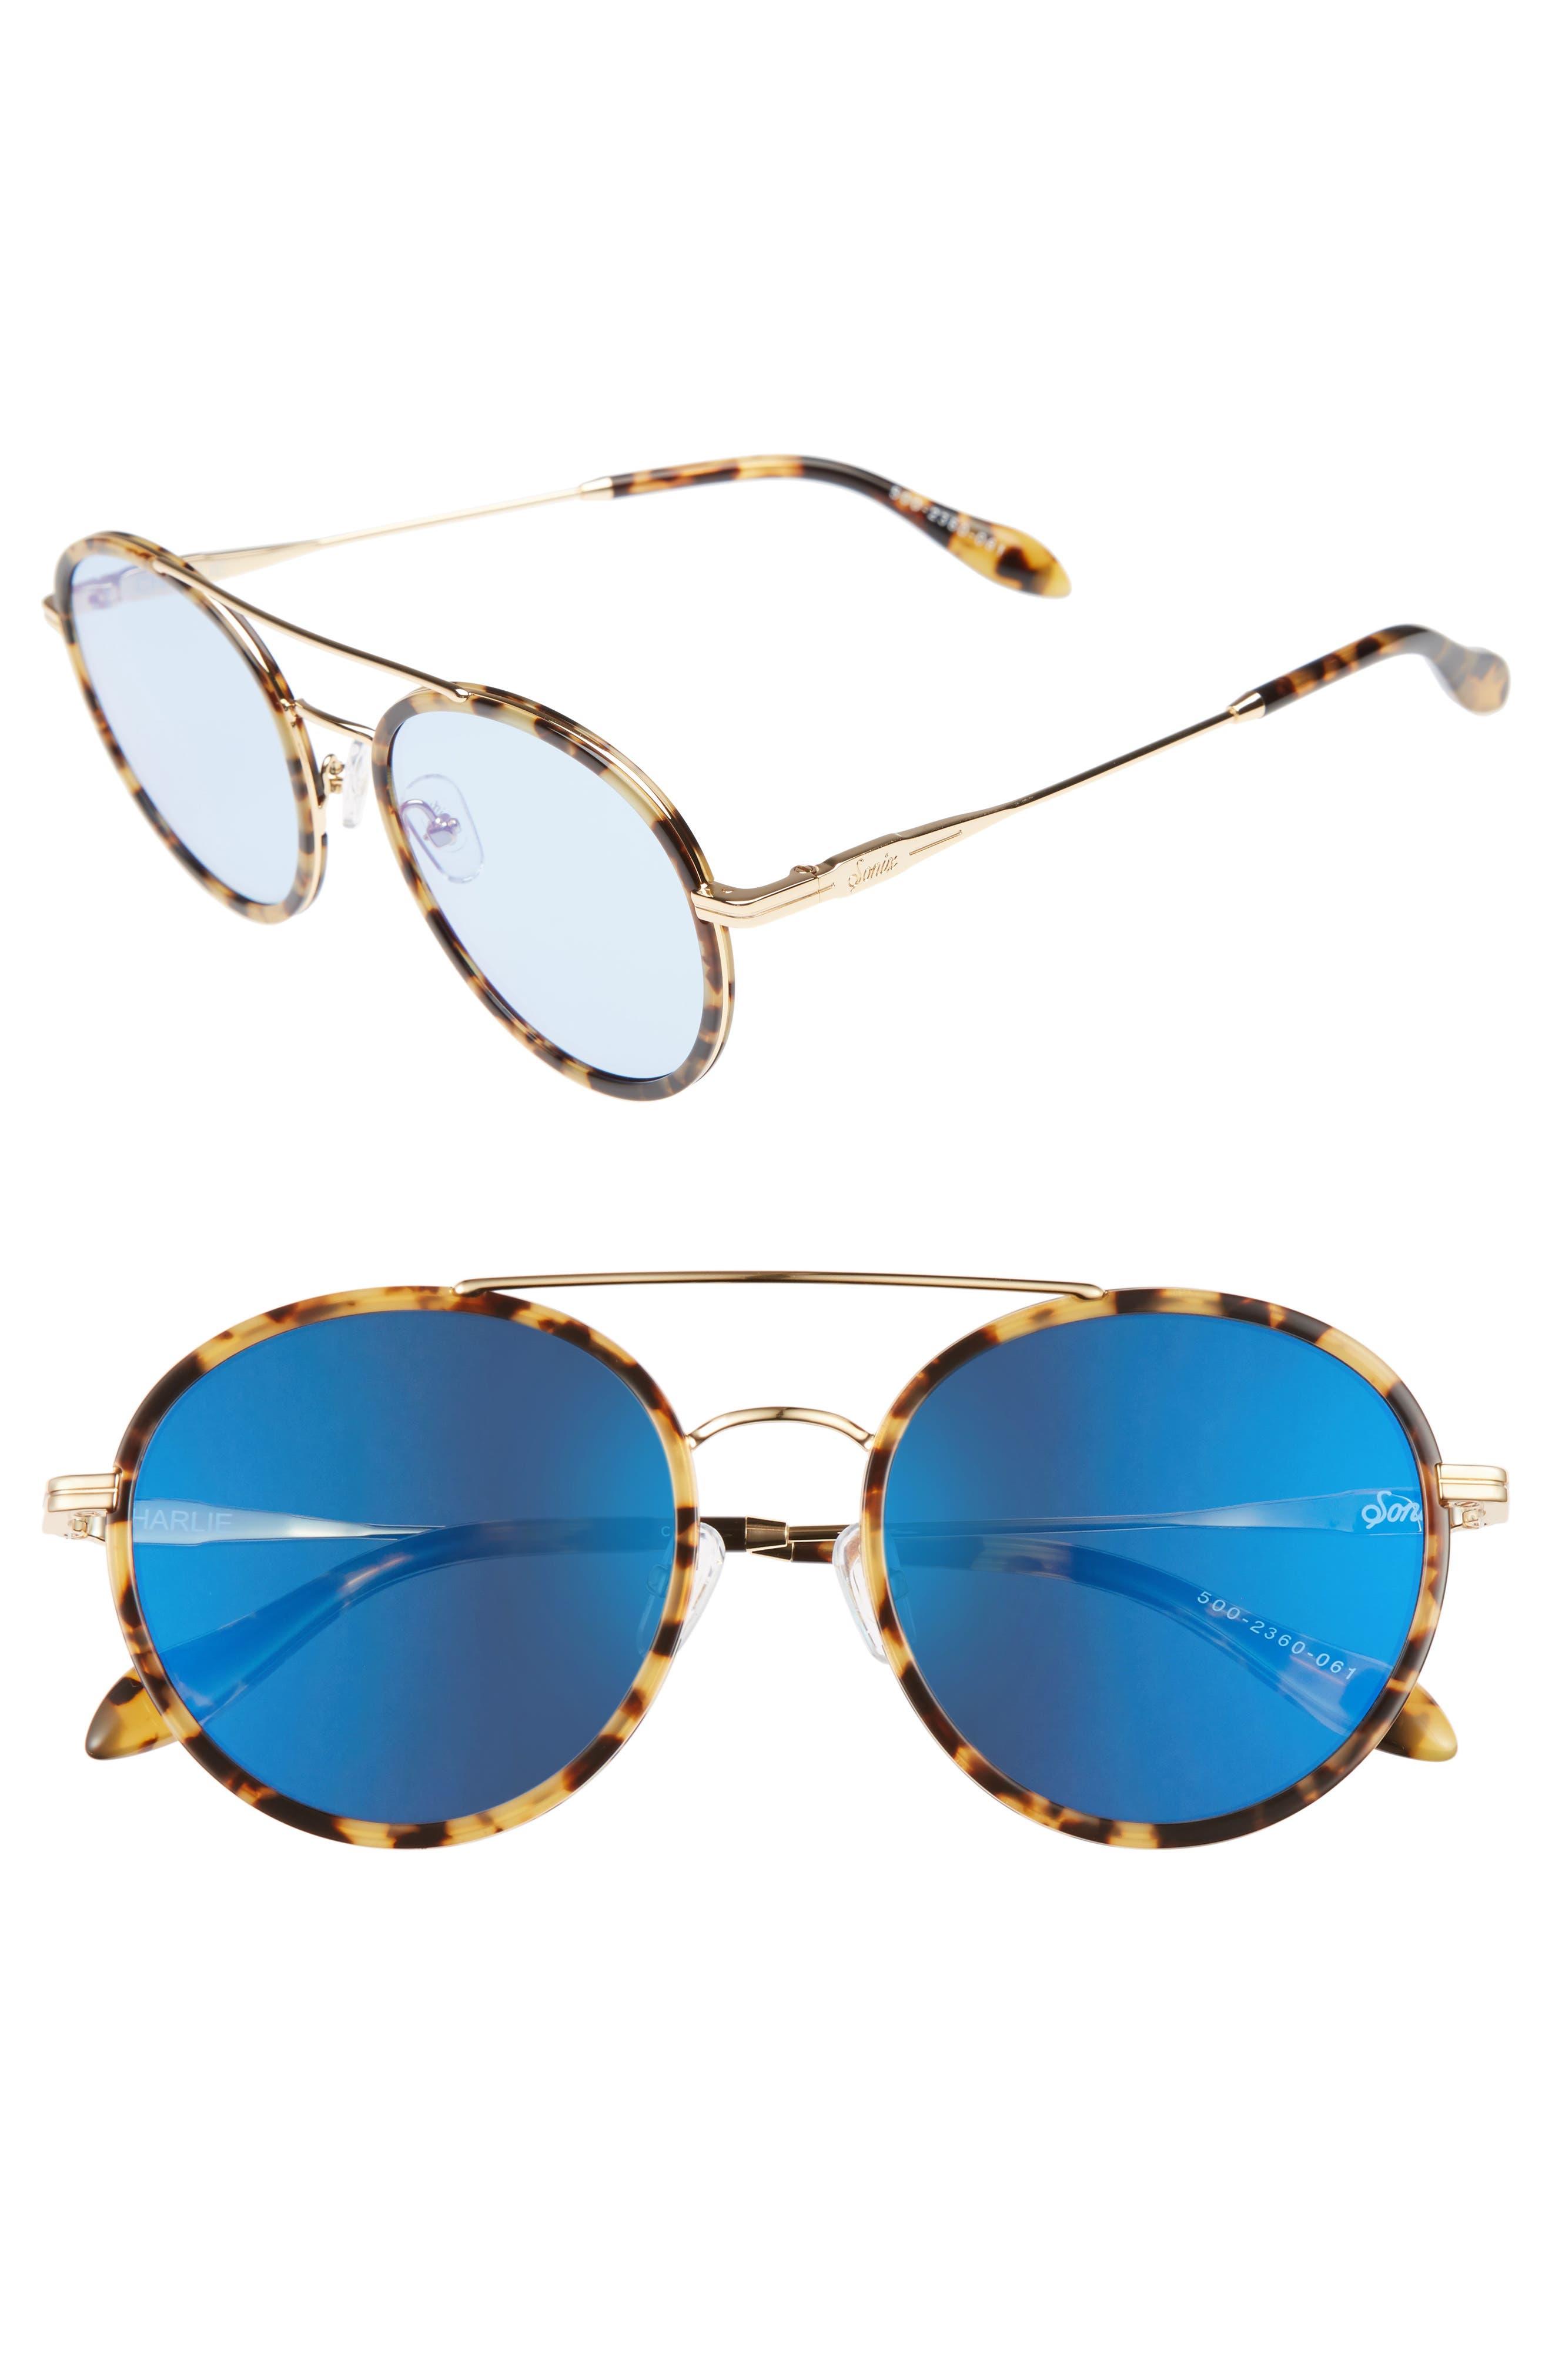 Charli 50mm Mirrored Lens Round Sunglasses,                             Main thumbnail 1, color,                             Brown Tortoise/ Powder Mirror